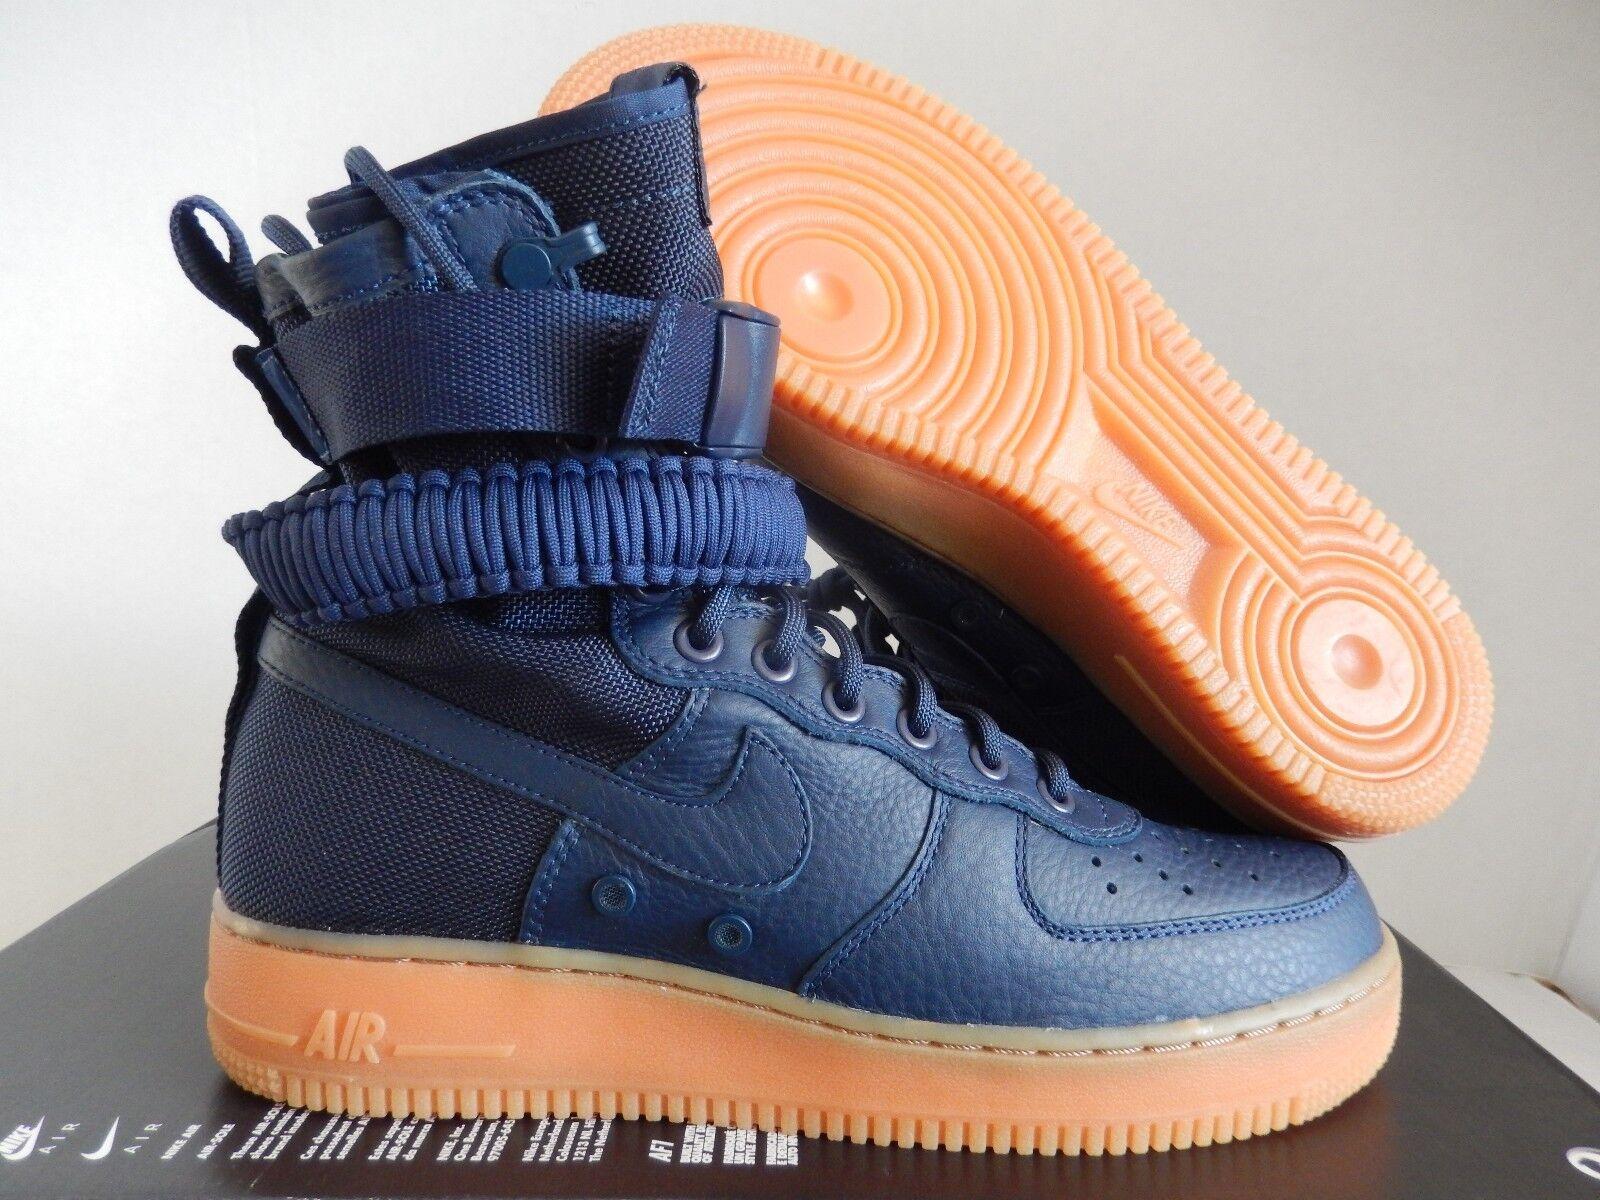 Nike air force 1 sf af1 speciale campo mezzanotte blu navy sz [864024-400]